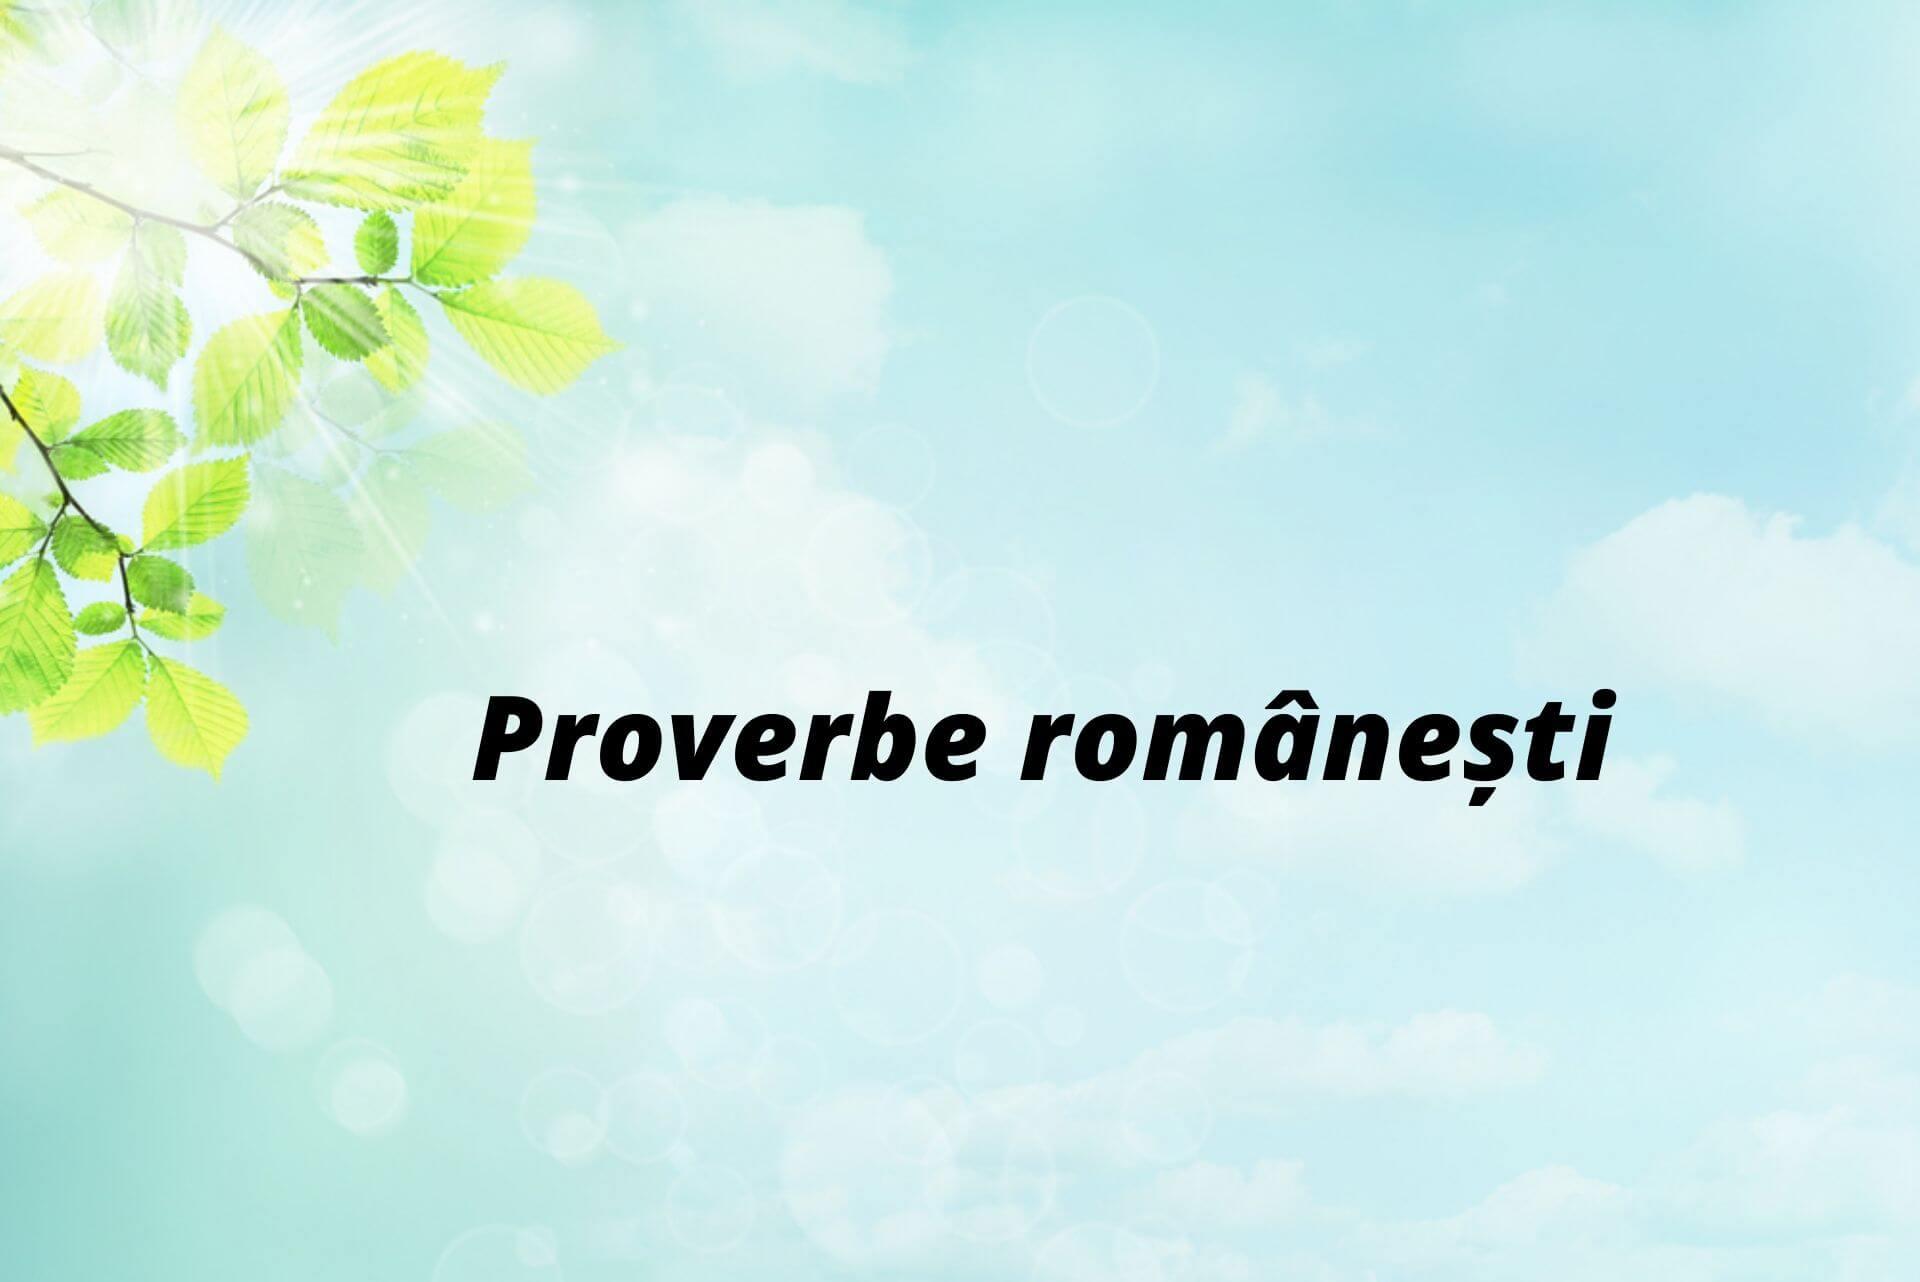 Proverbe cu animale